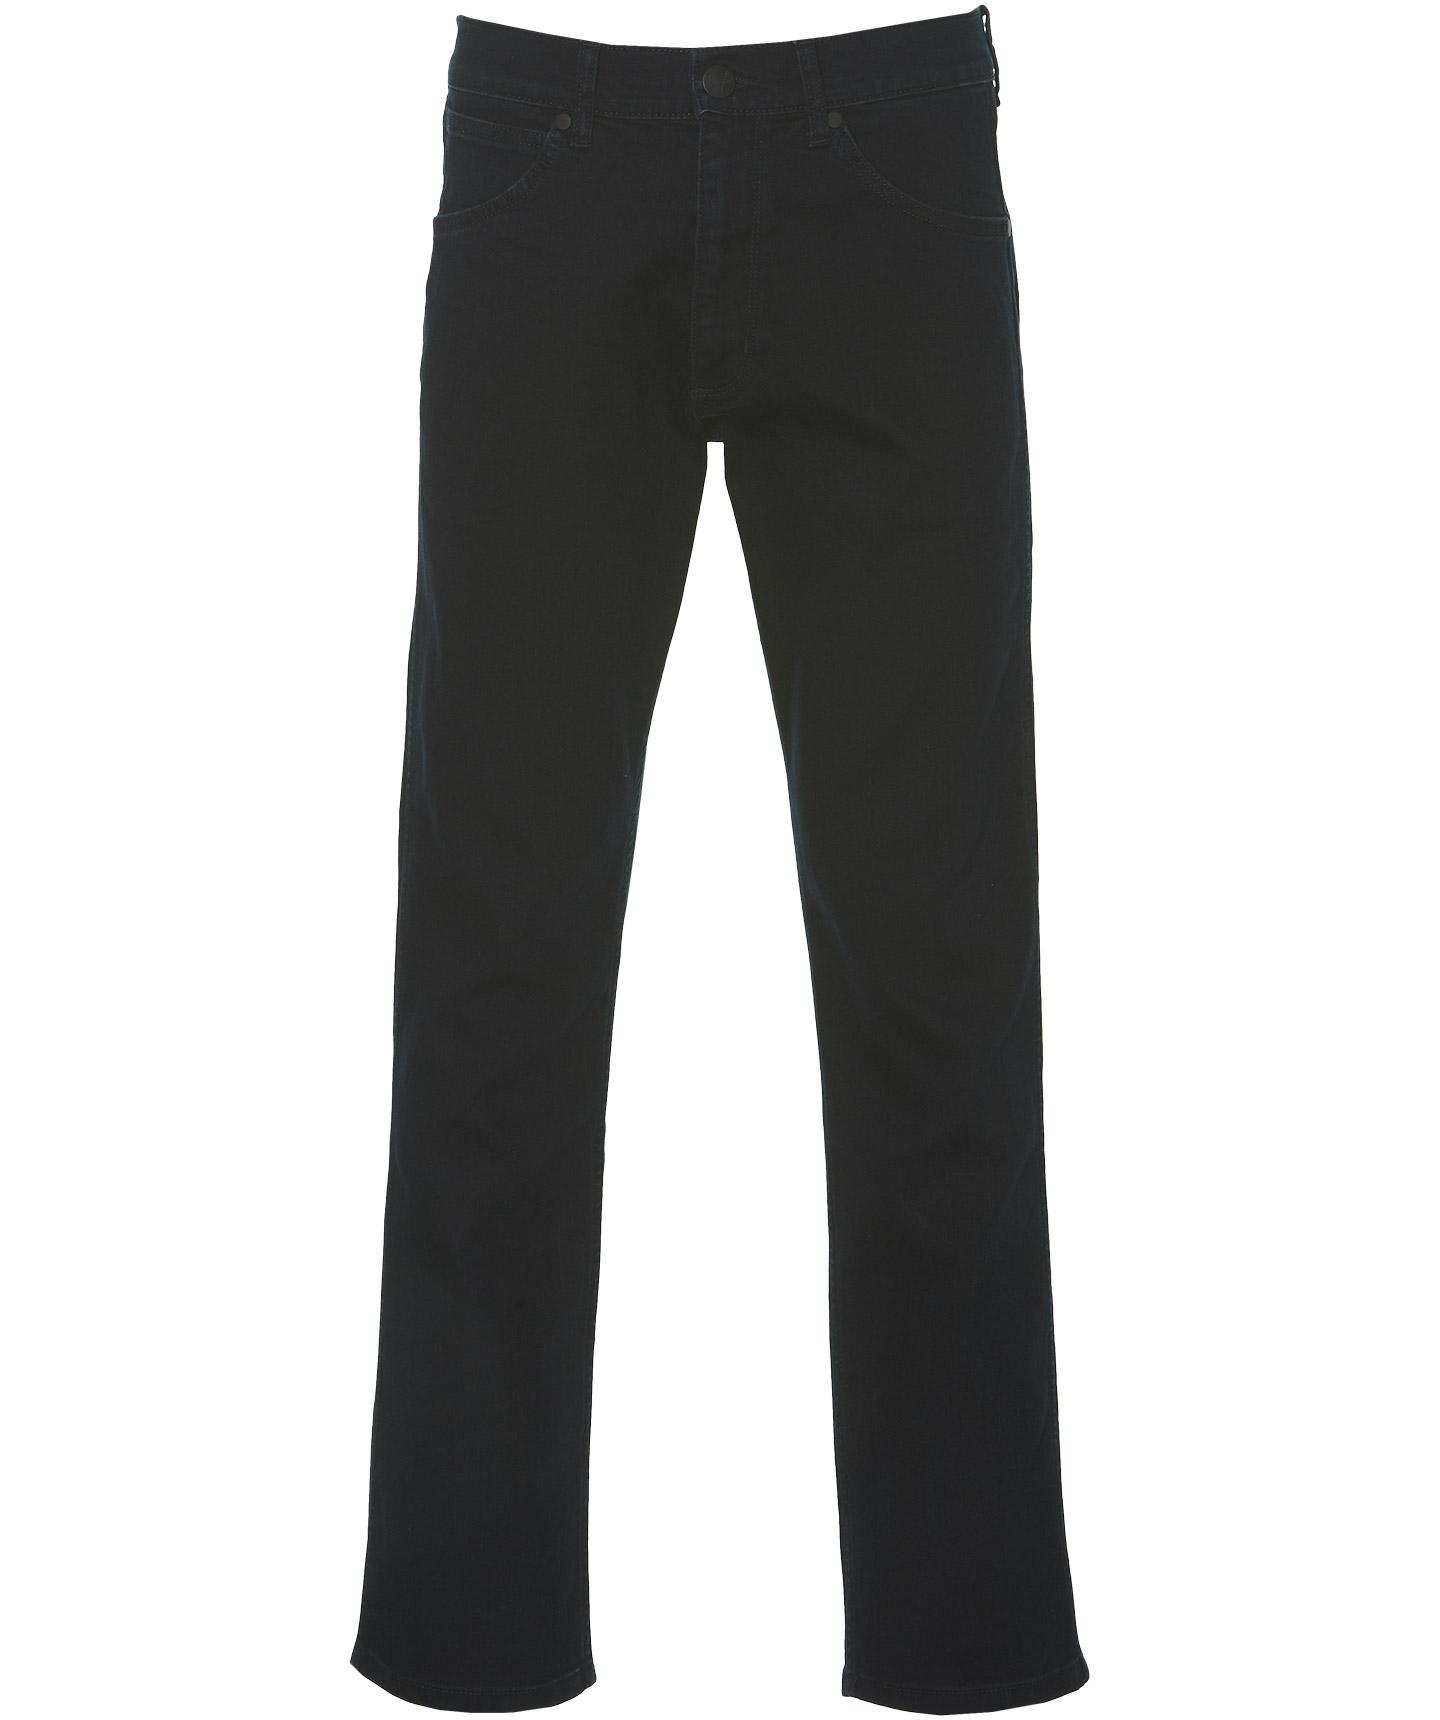 Wrangler Jeans Greensboro -modern Fit- Blauw